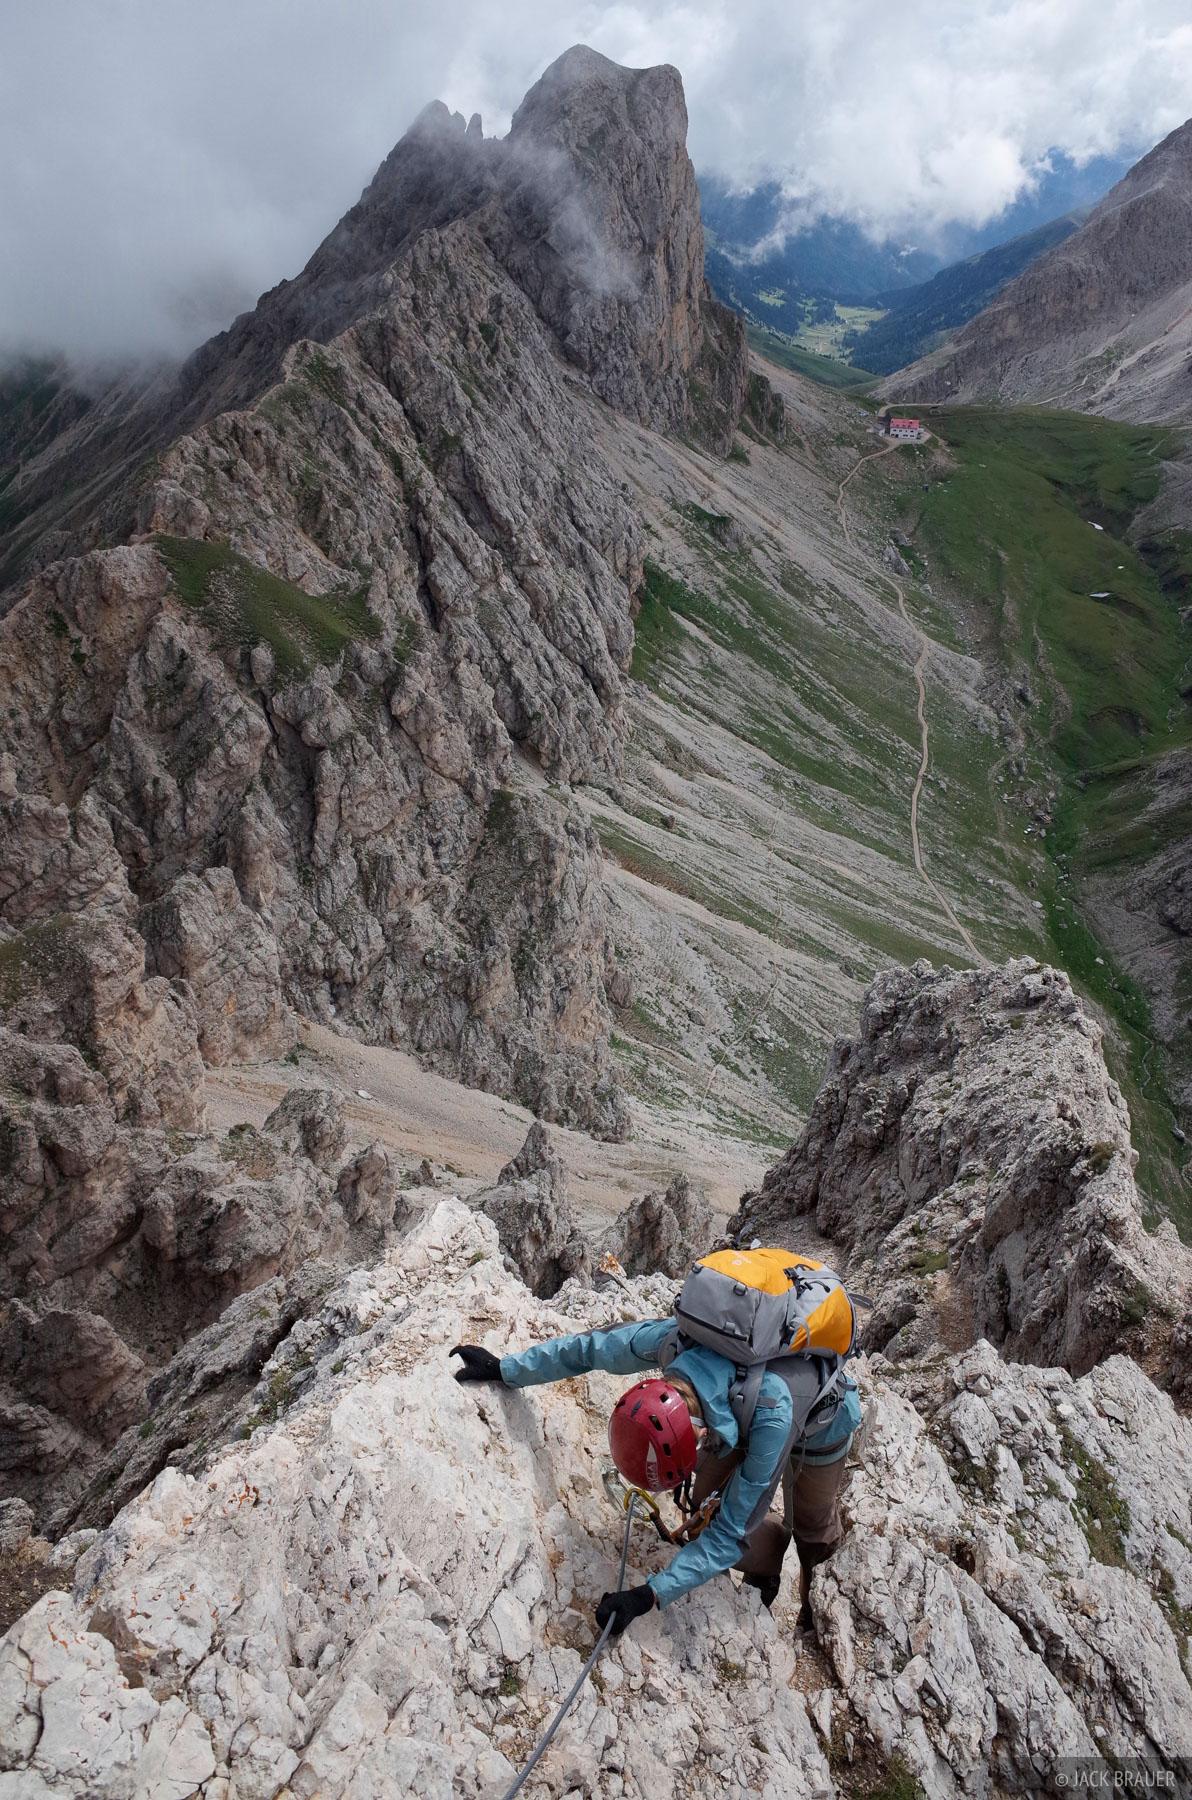 Dolomites, Italy, Rosengarten, via ferrata, Maximilian, Maximiliansteig, Alpe di Tires, photo